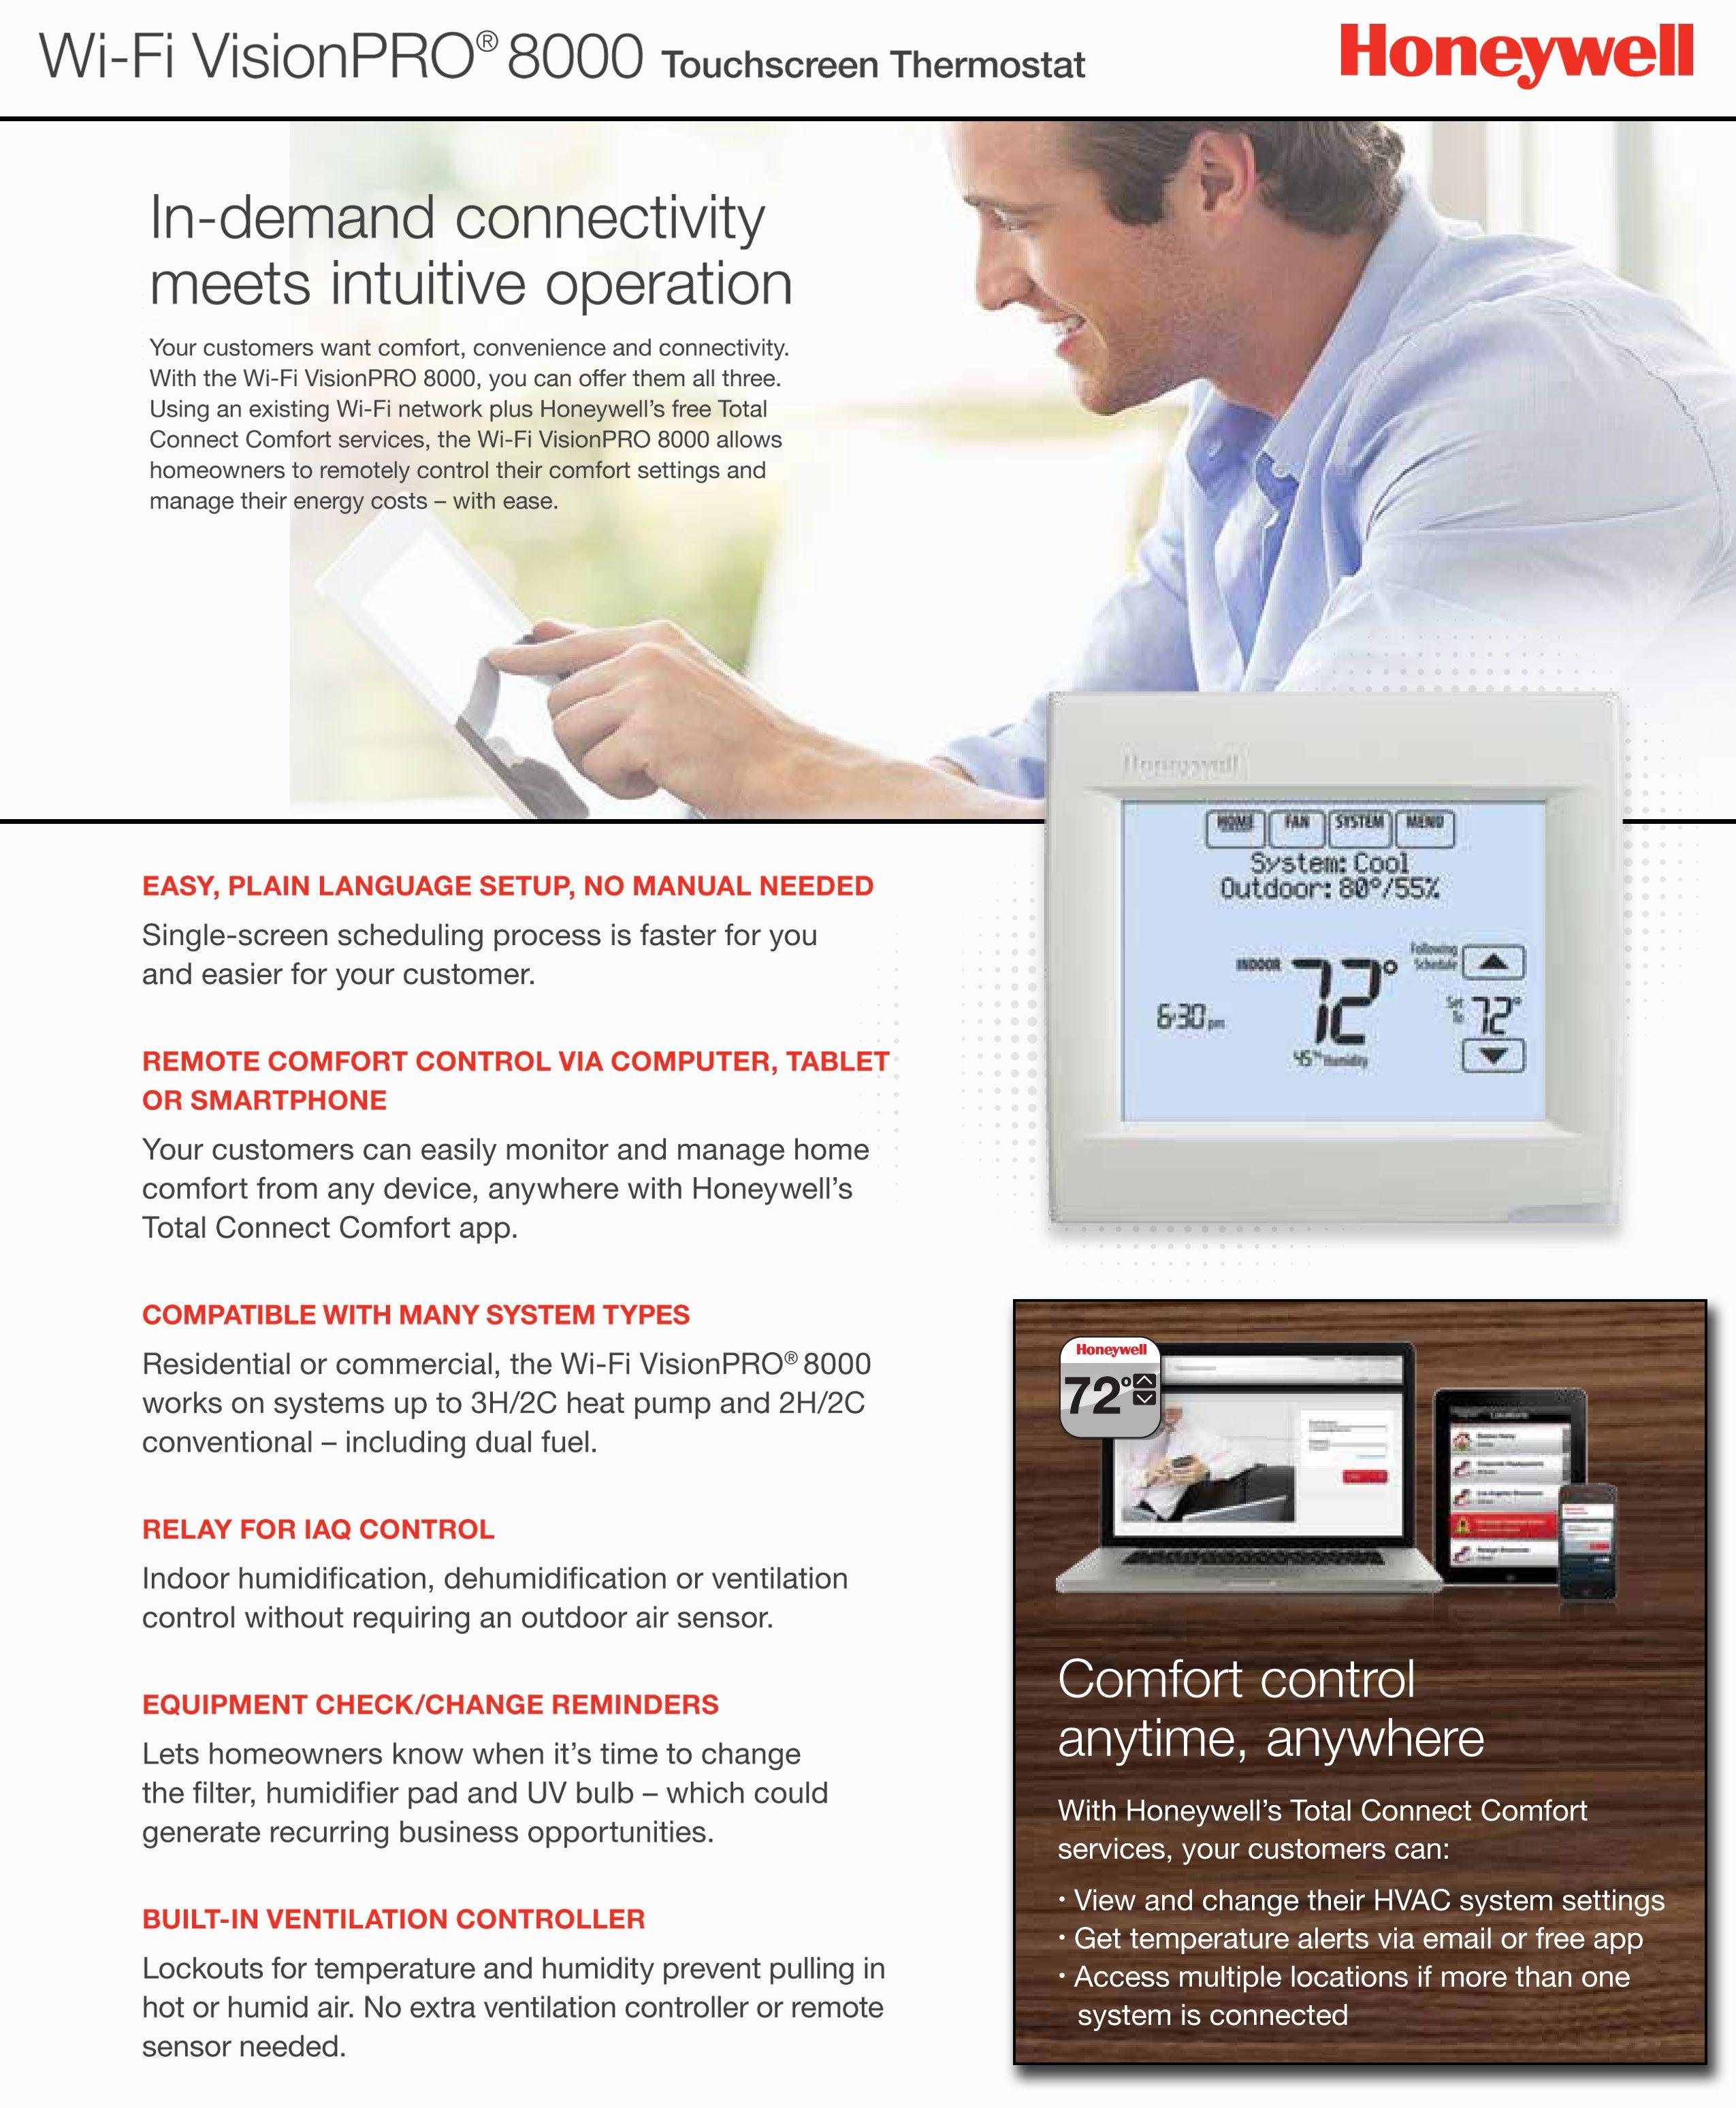 Honeywell pro 8000 wifi touchsrceen thermostat 3h2c